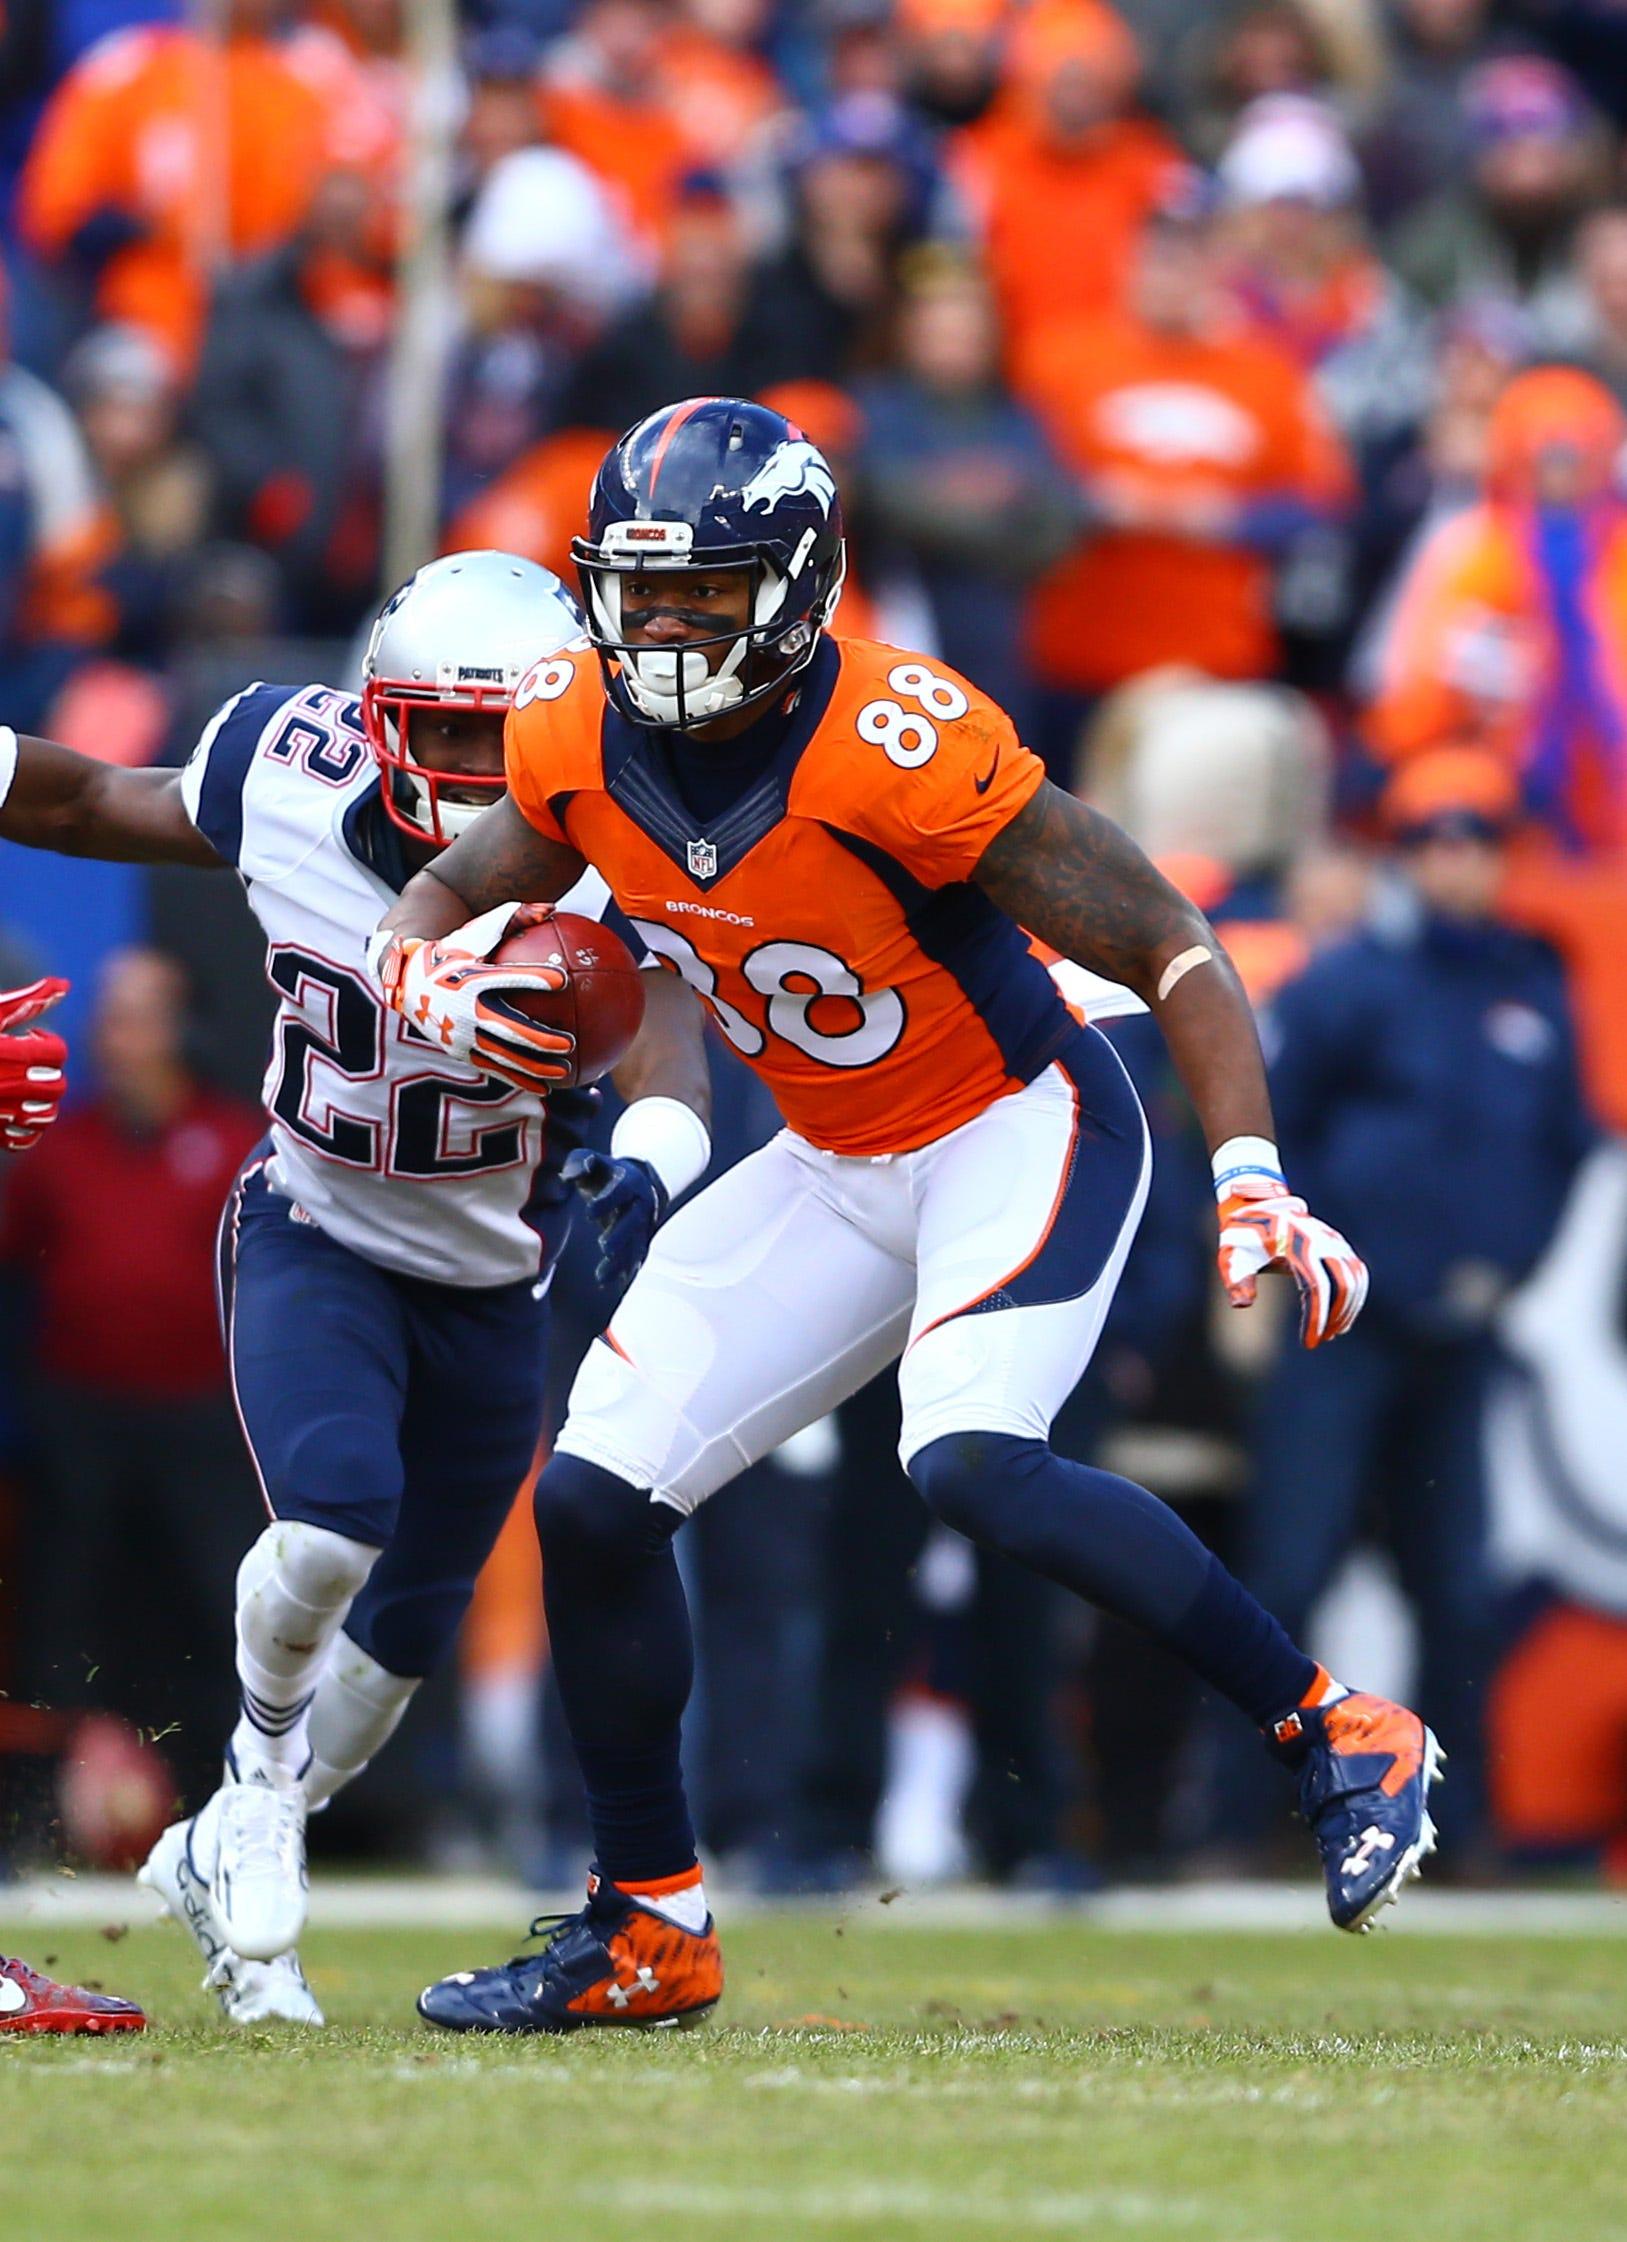 Patriots sign former Pro Bowl wide receiver Demaryius Thomas